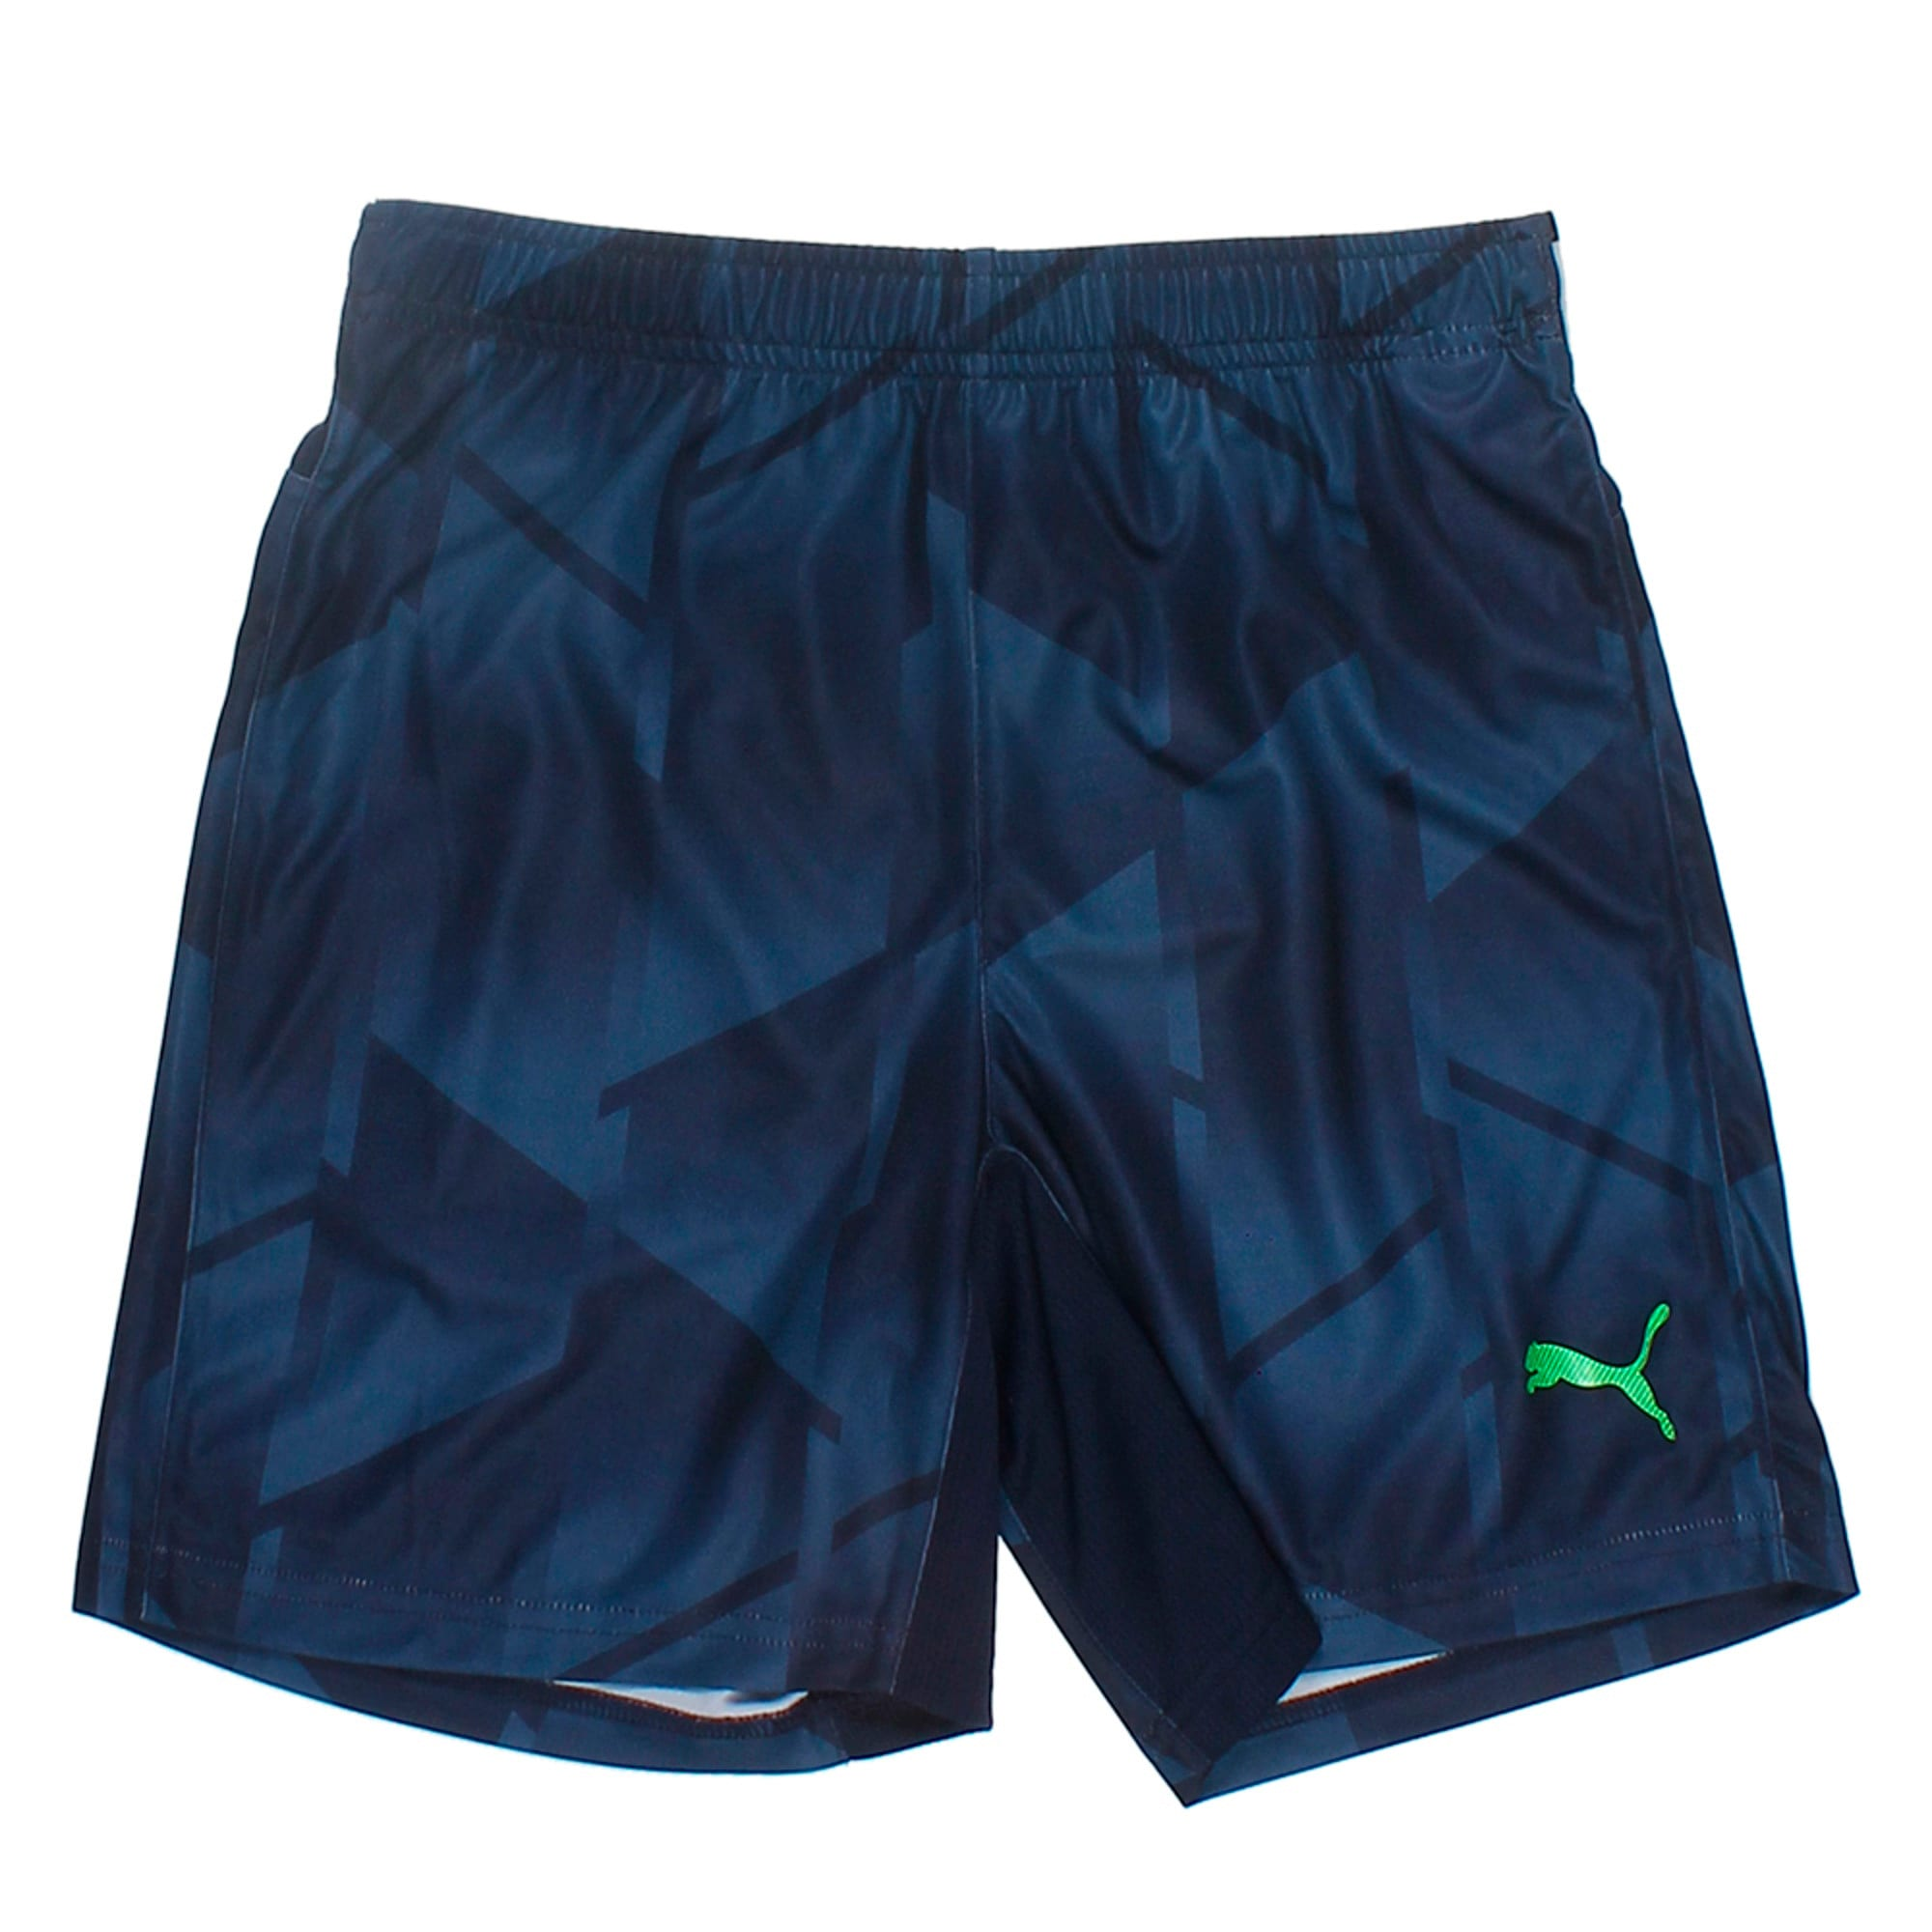 Thumbnail 2 of ftblNXT Pro Shorts Jr Puma Black, Peacoat, medium-IND